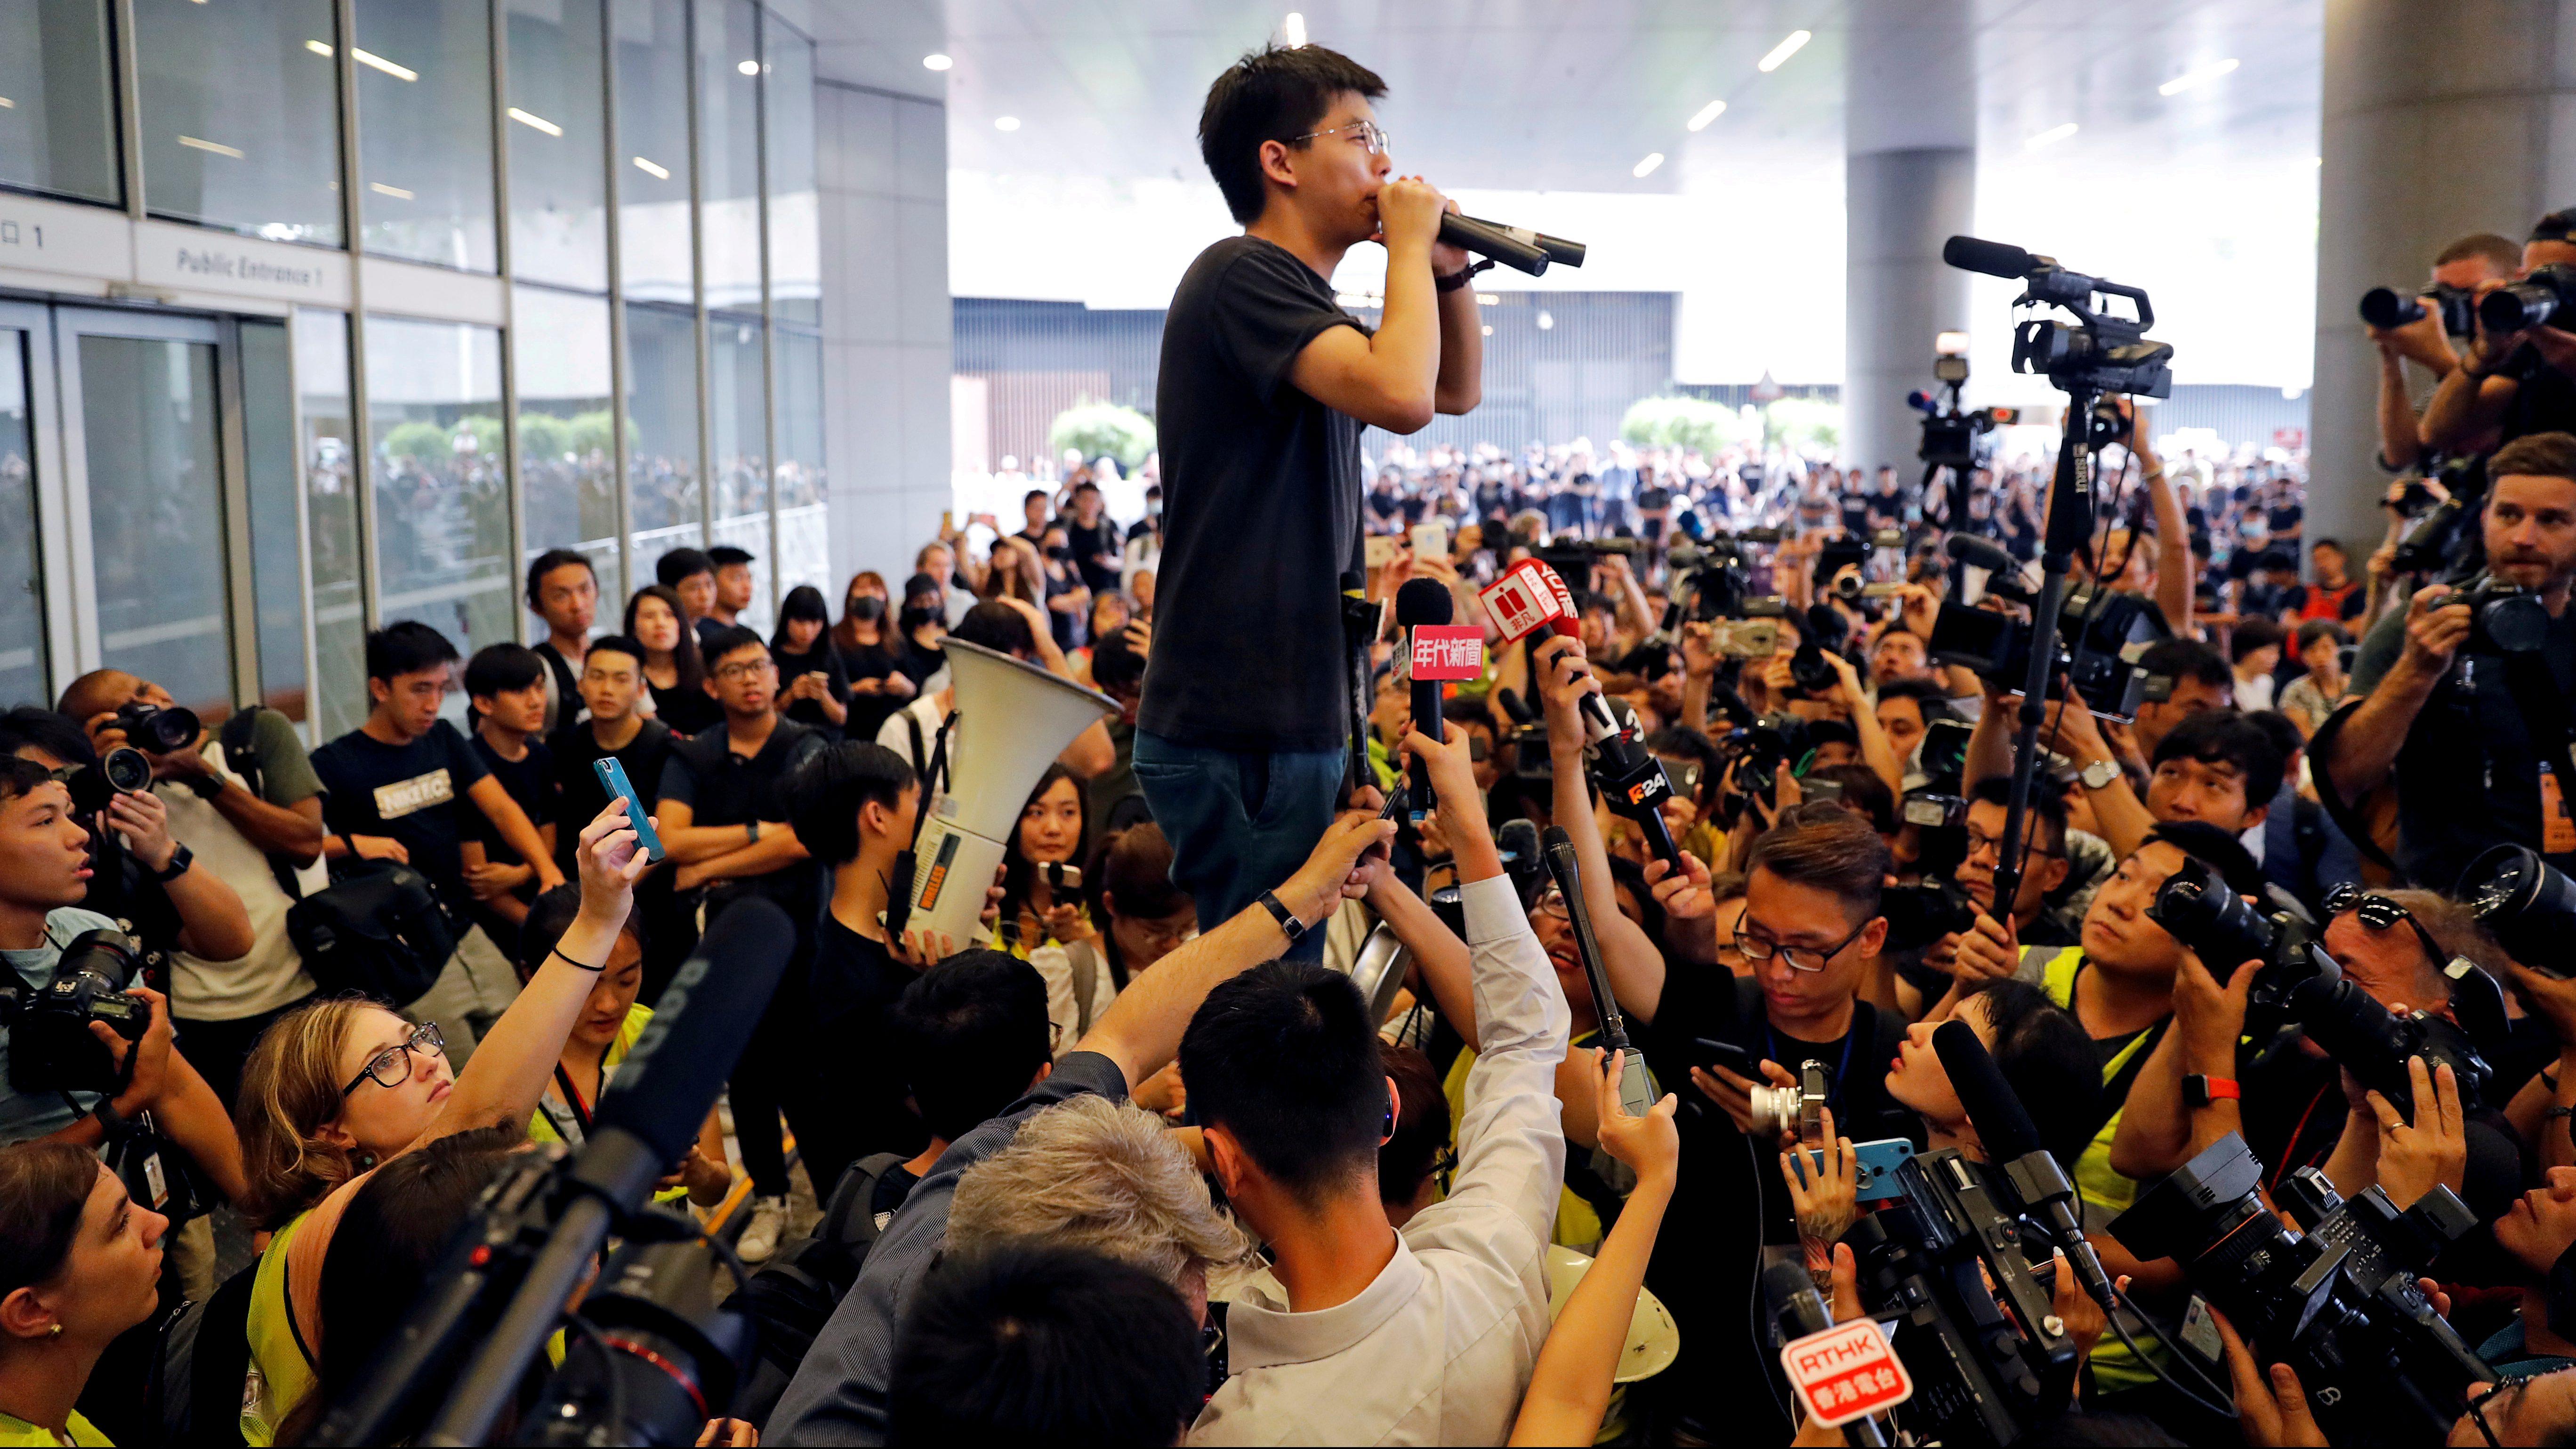 Pro-democracy activist Joshua Wong addresses the crowds outside the Legislative Council on June 17 2019